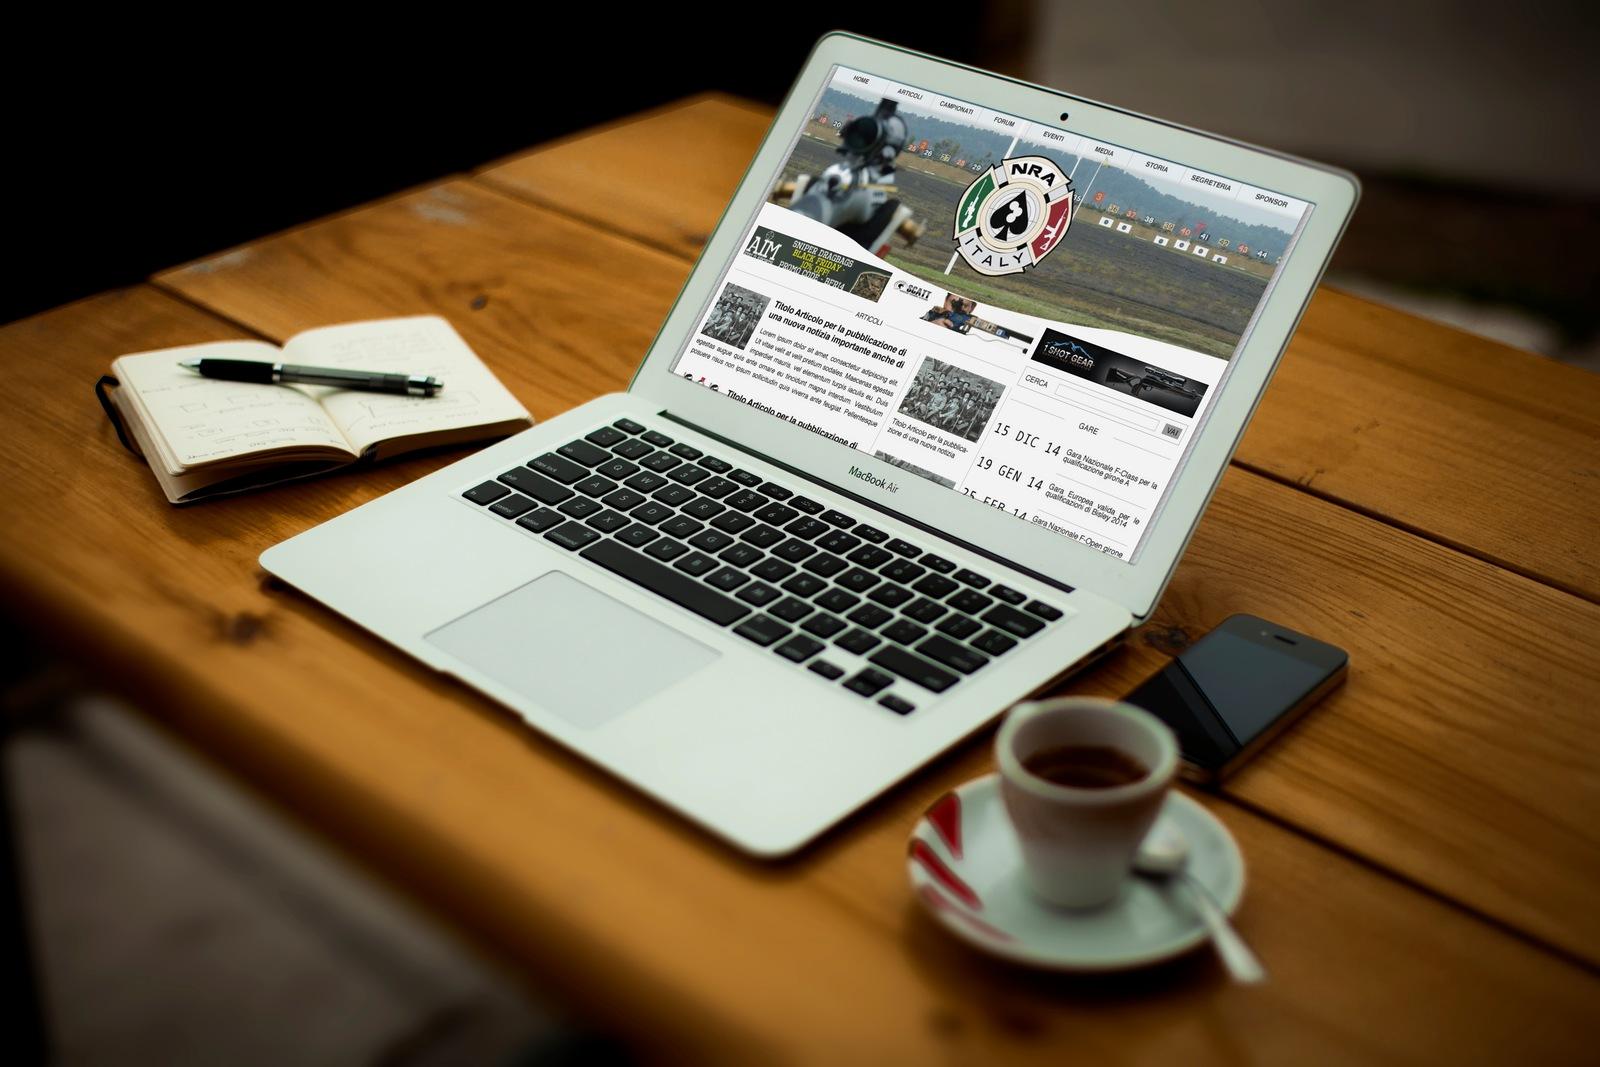 Sito web NRA Italia - Tiro Lunga Distanza